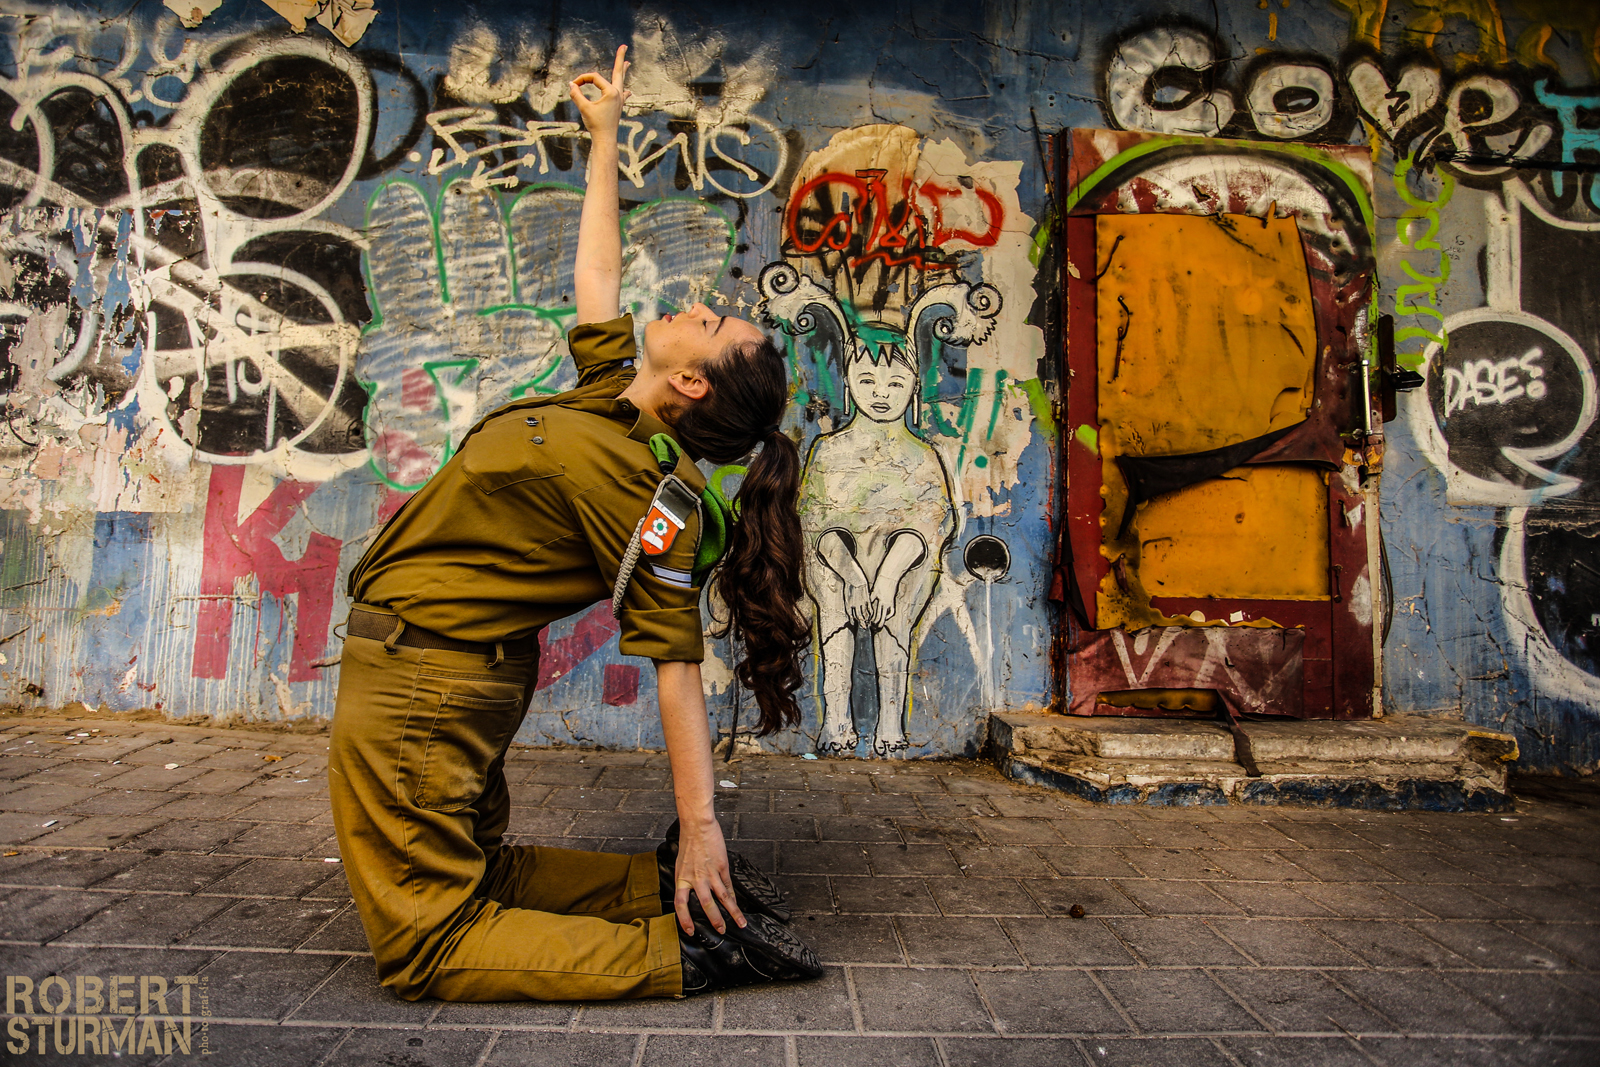 Israeli soldier Mor Gutwillig doing yoga on a Tel Aviv street. Photo by Robert Sturman